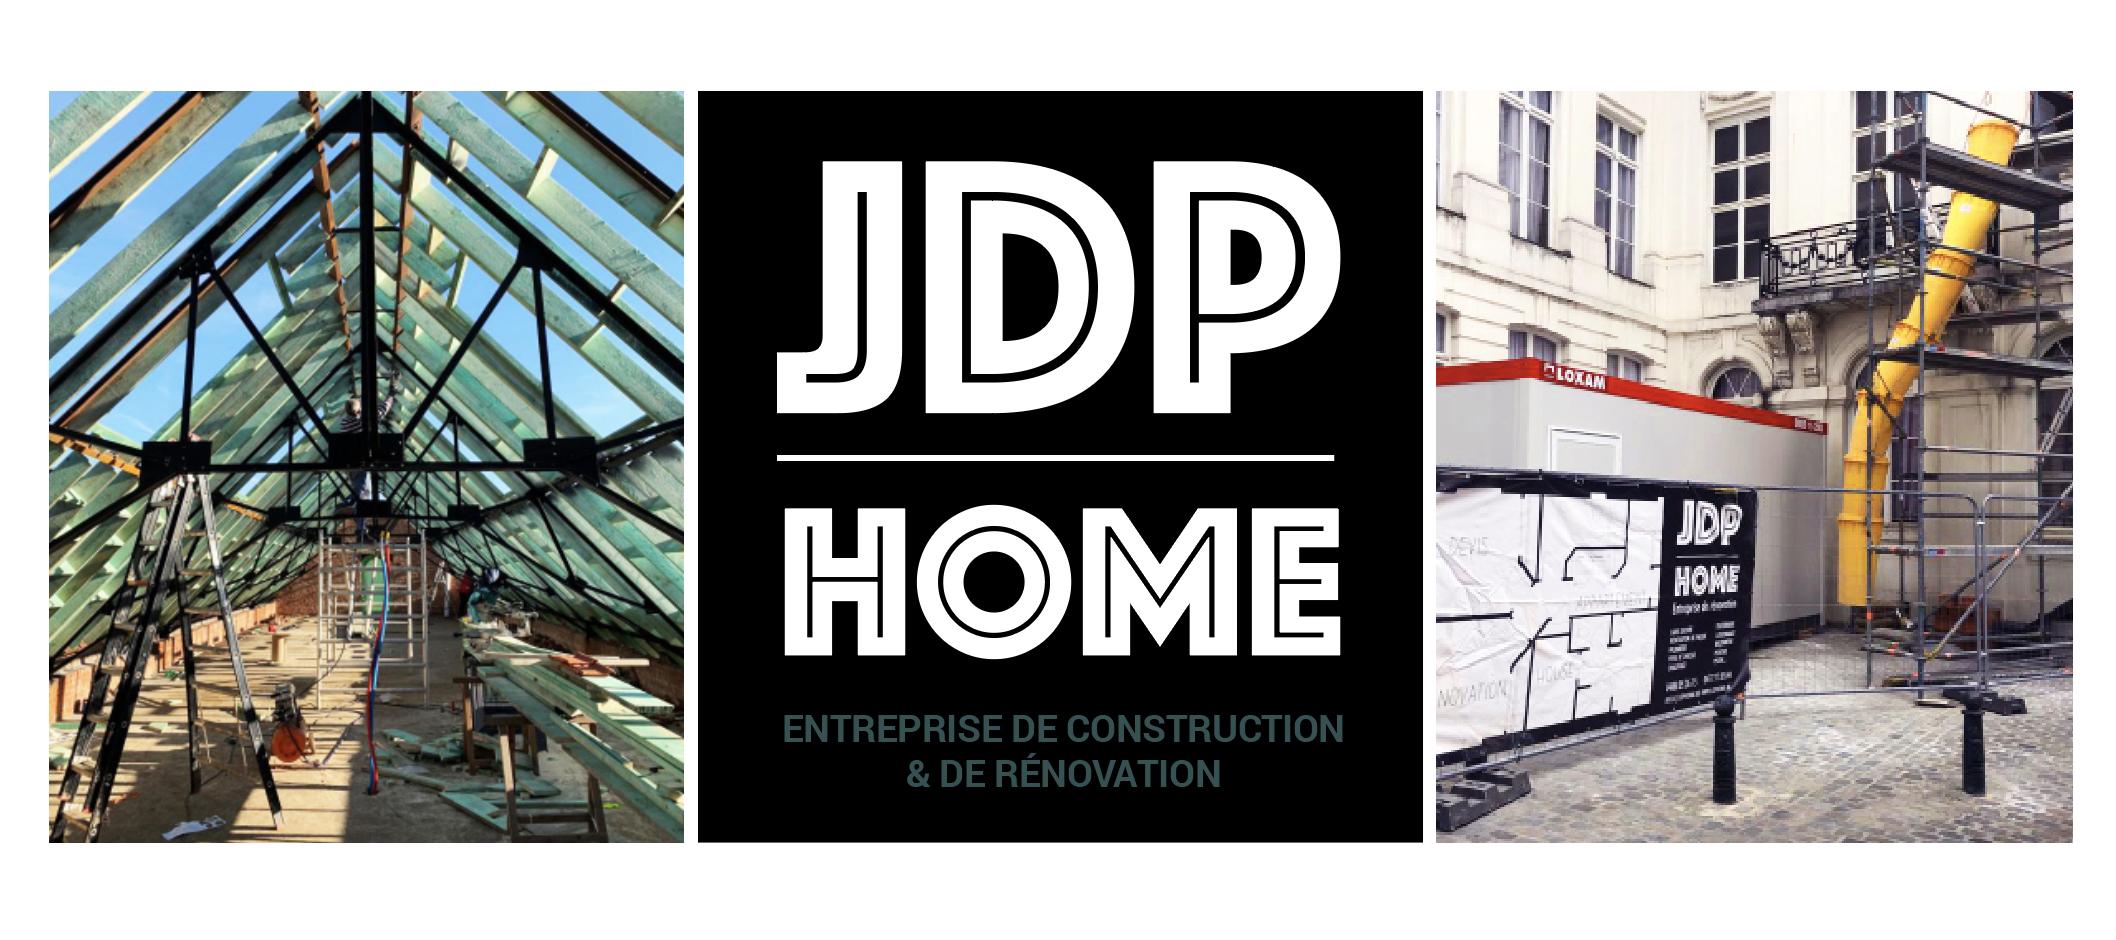 JDP HOME